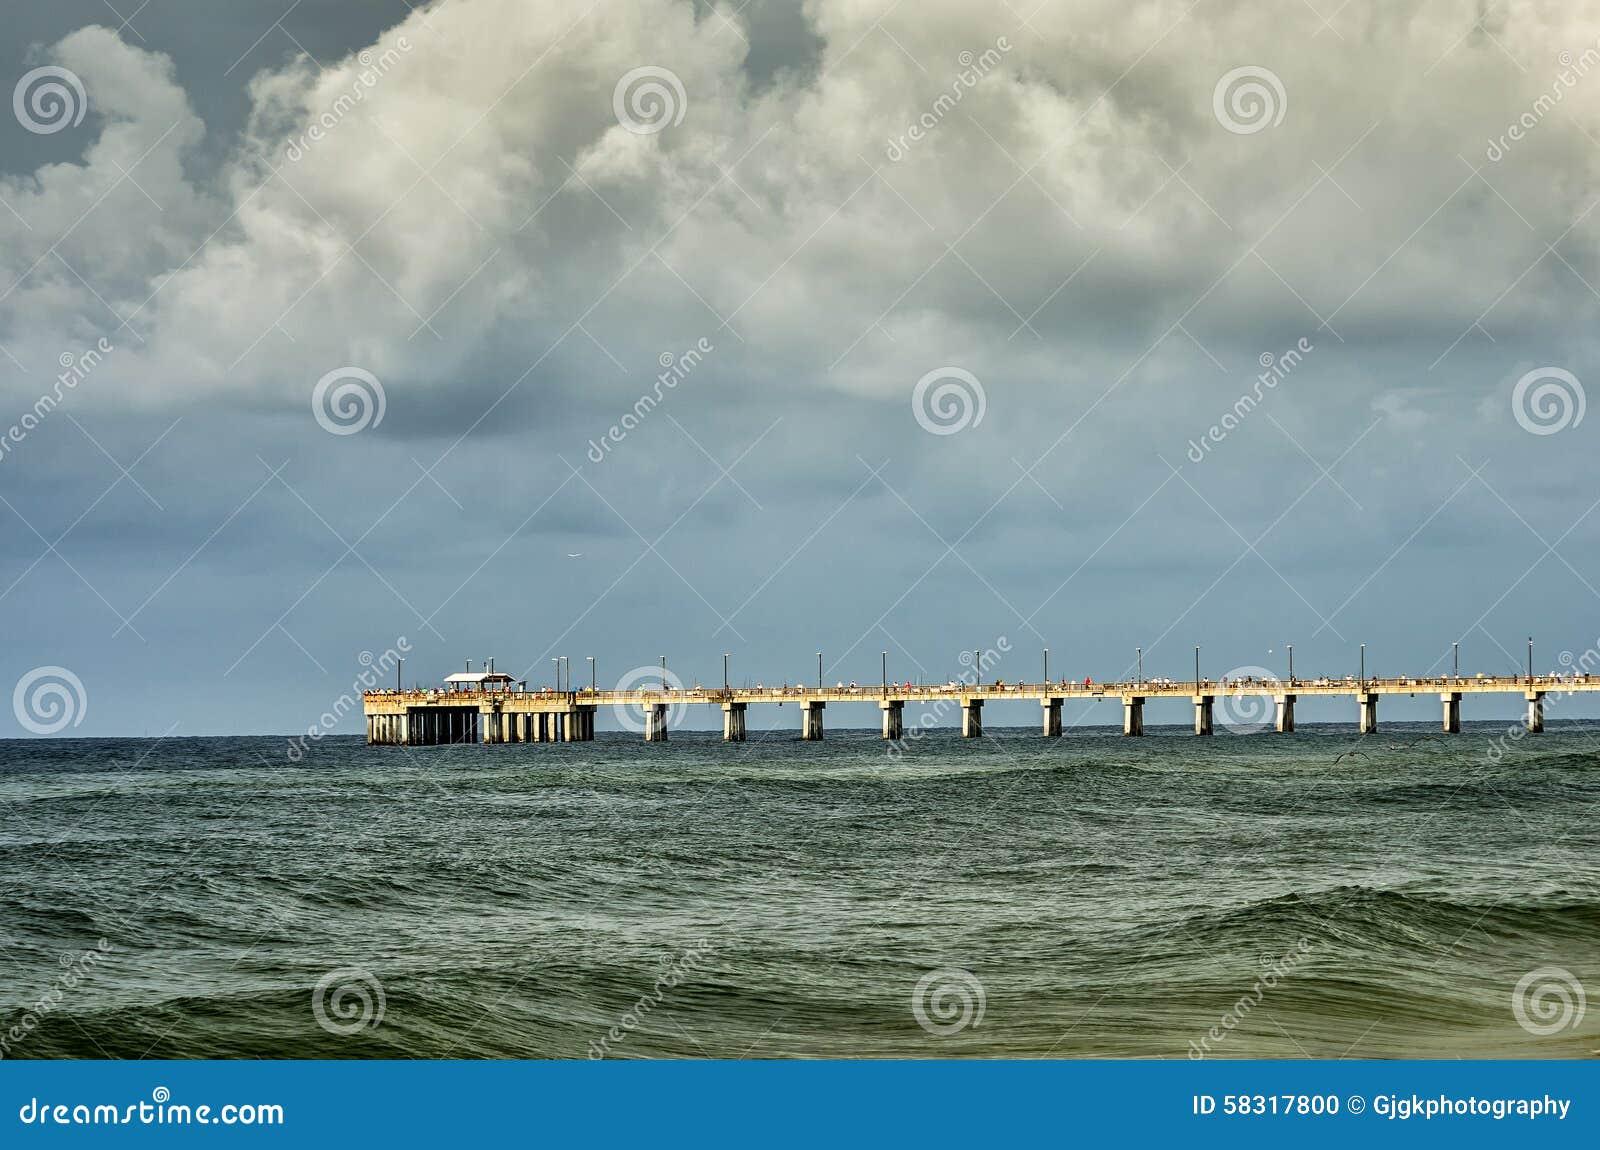 Gulf shores al fishing pier stock photo image 58317800 for Pier fishing gulf shores al